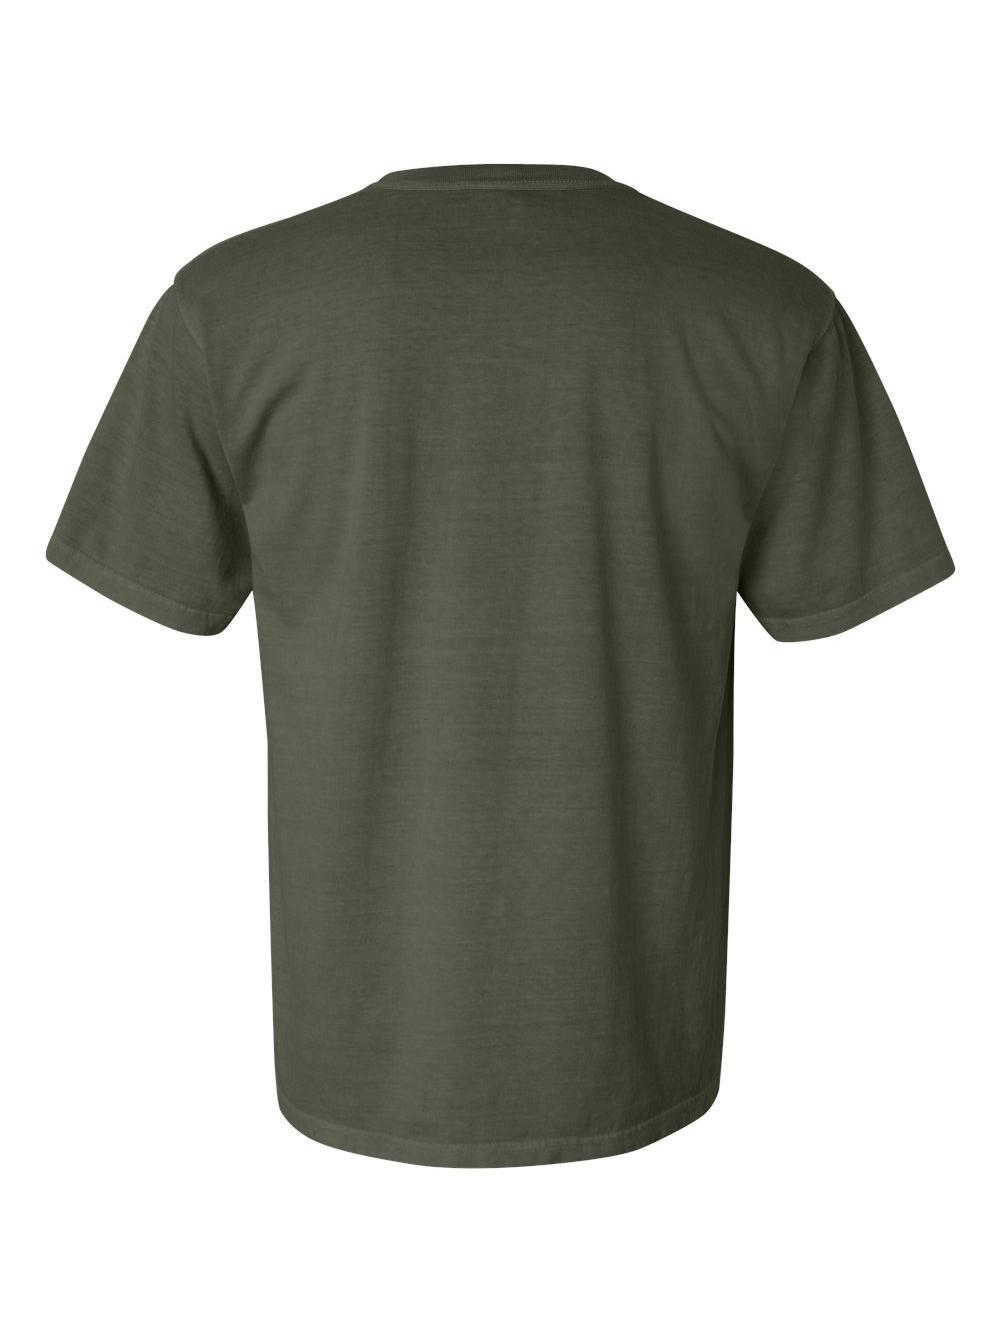 Comfort-Colors-Garment-Dyed-Heavyweight-Ringspun-Short-Sleeve-Shirt-1717 thumbnail 112